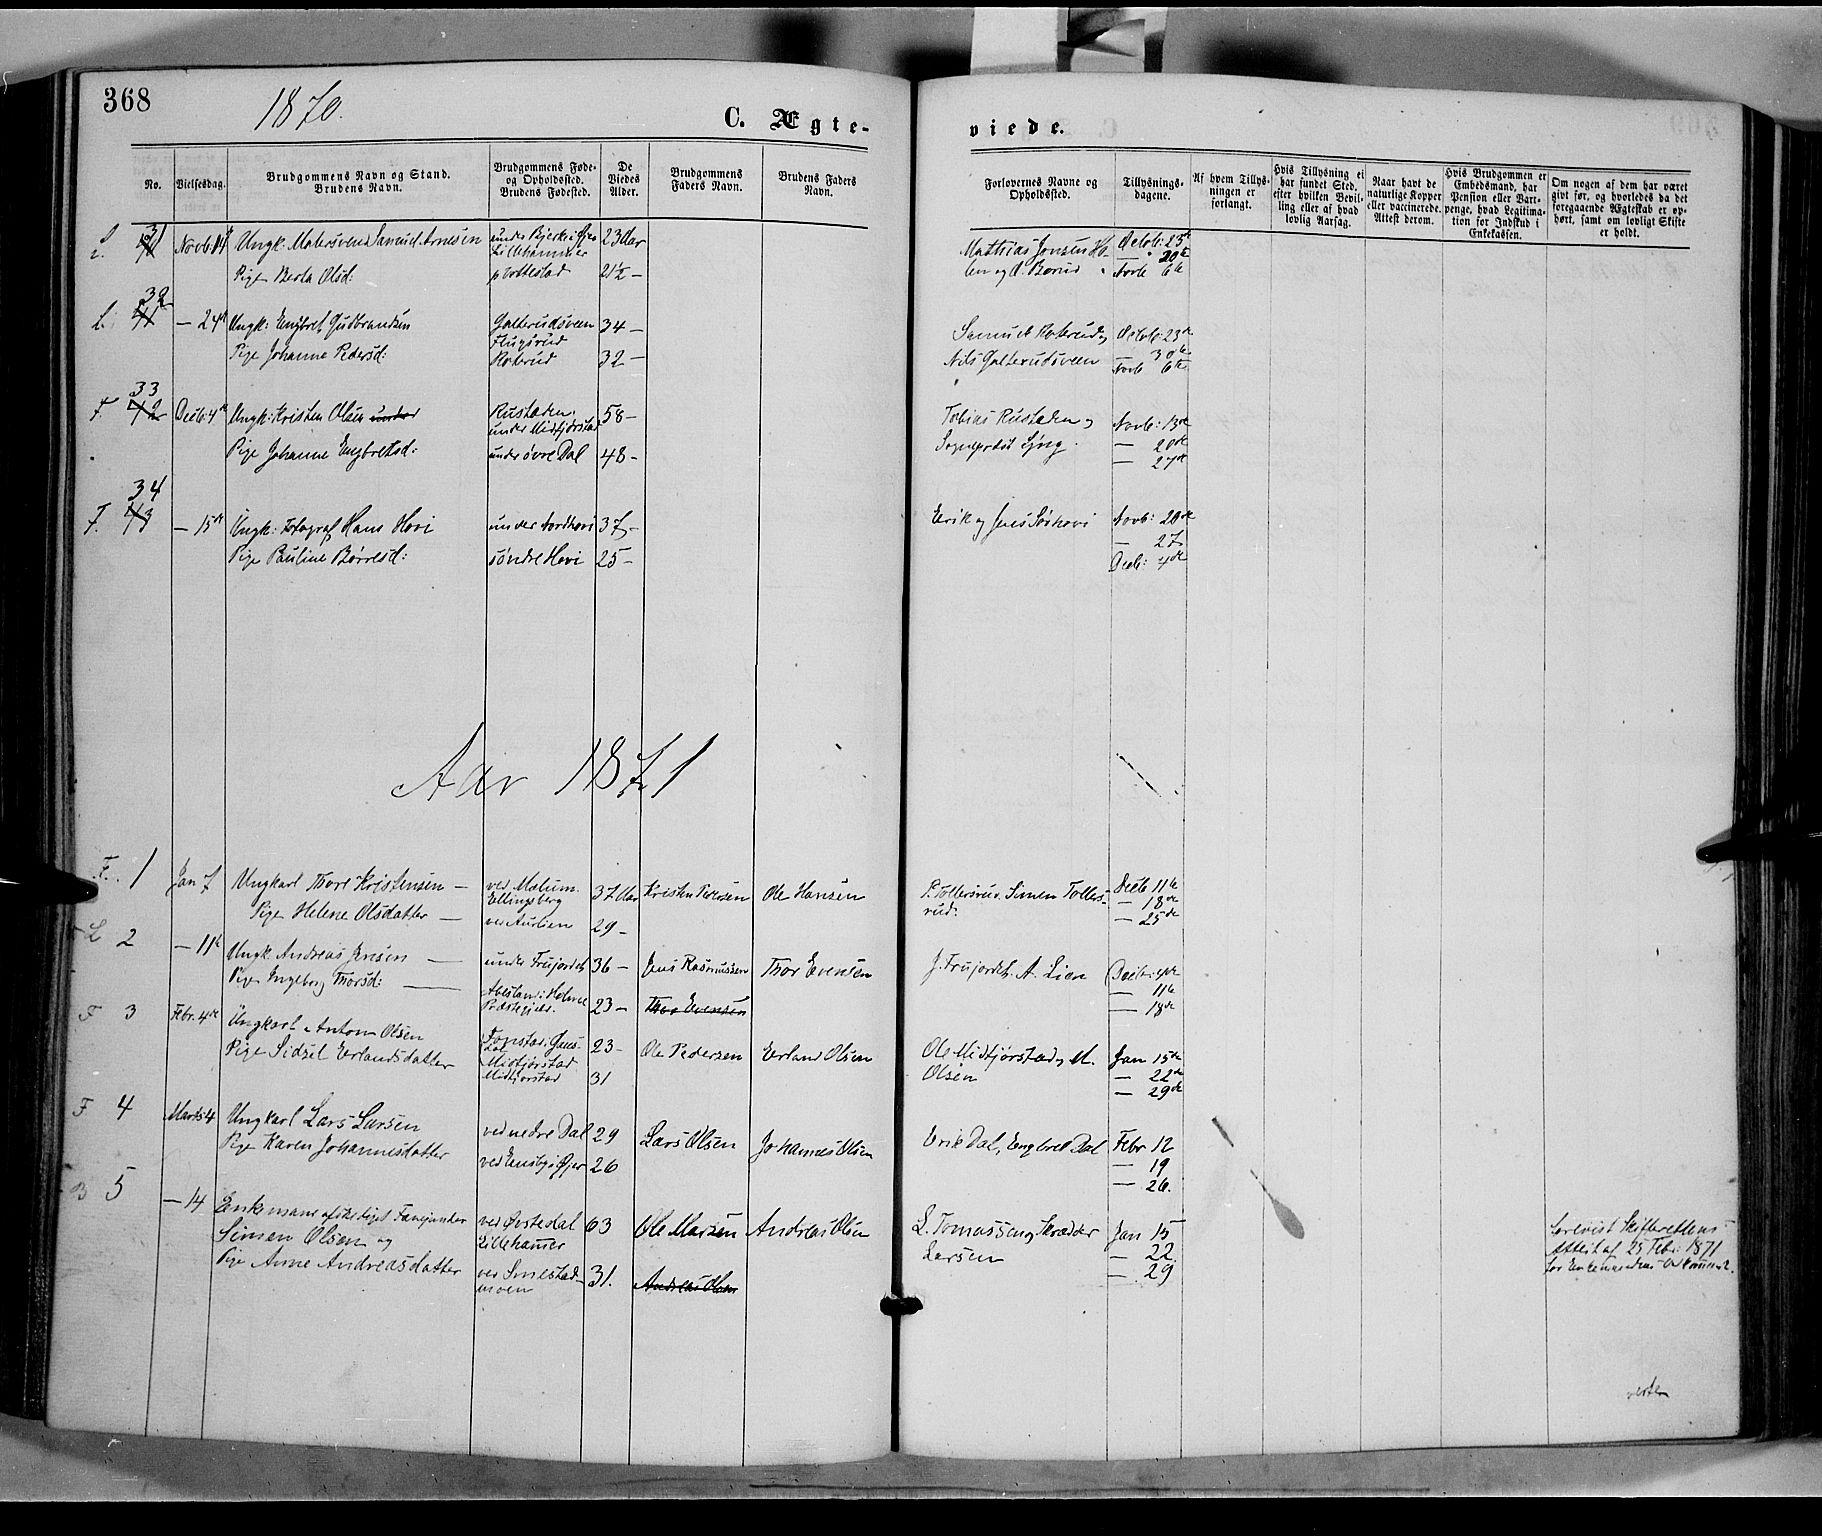 SAH, Fåberg prestekontor, Ministerialbok nr. 7, 1868-1878, s. 368